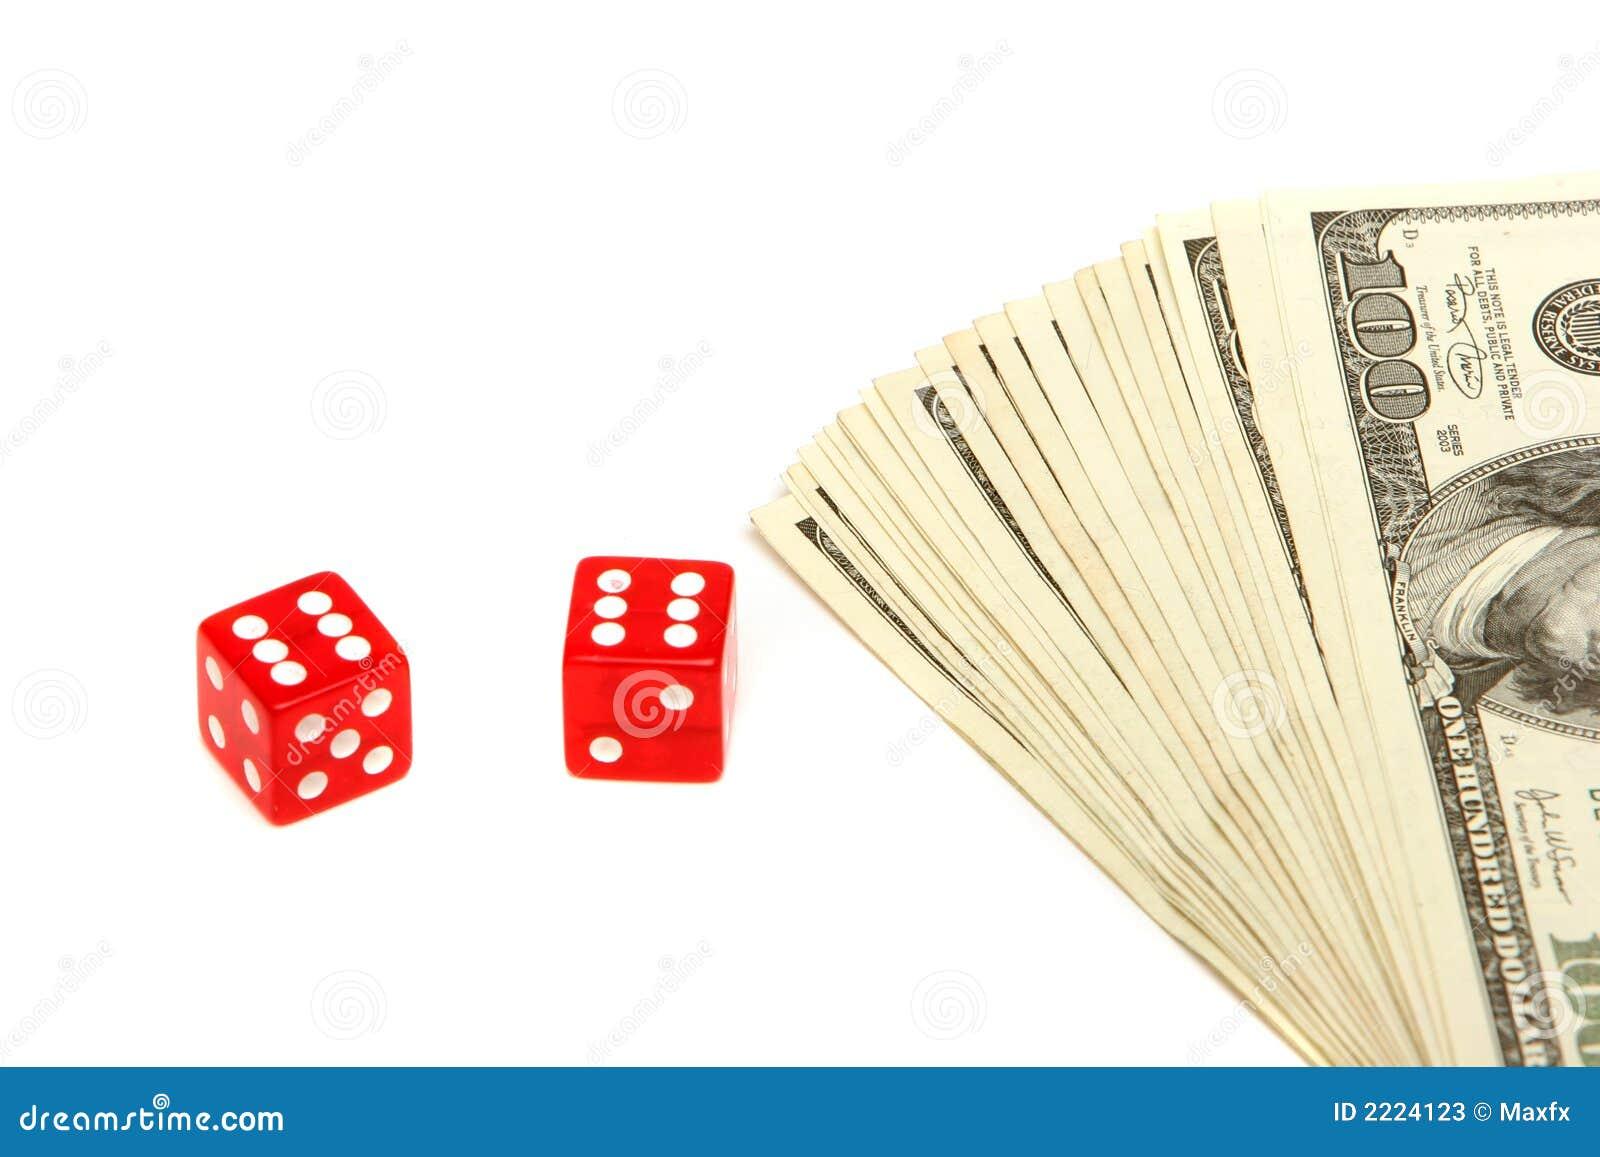 Gambling finance